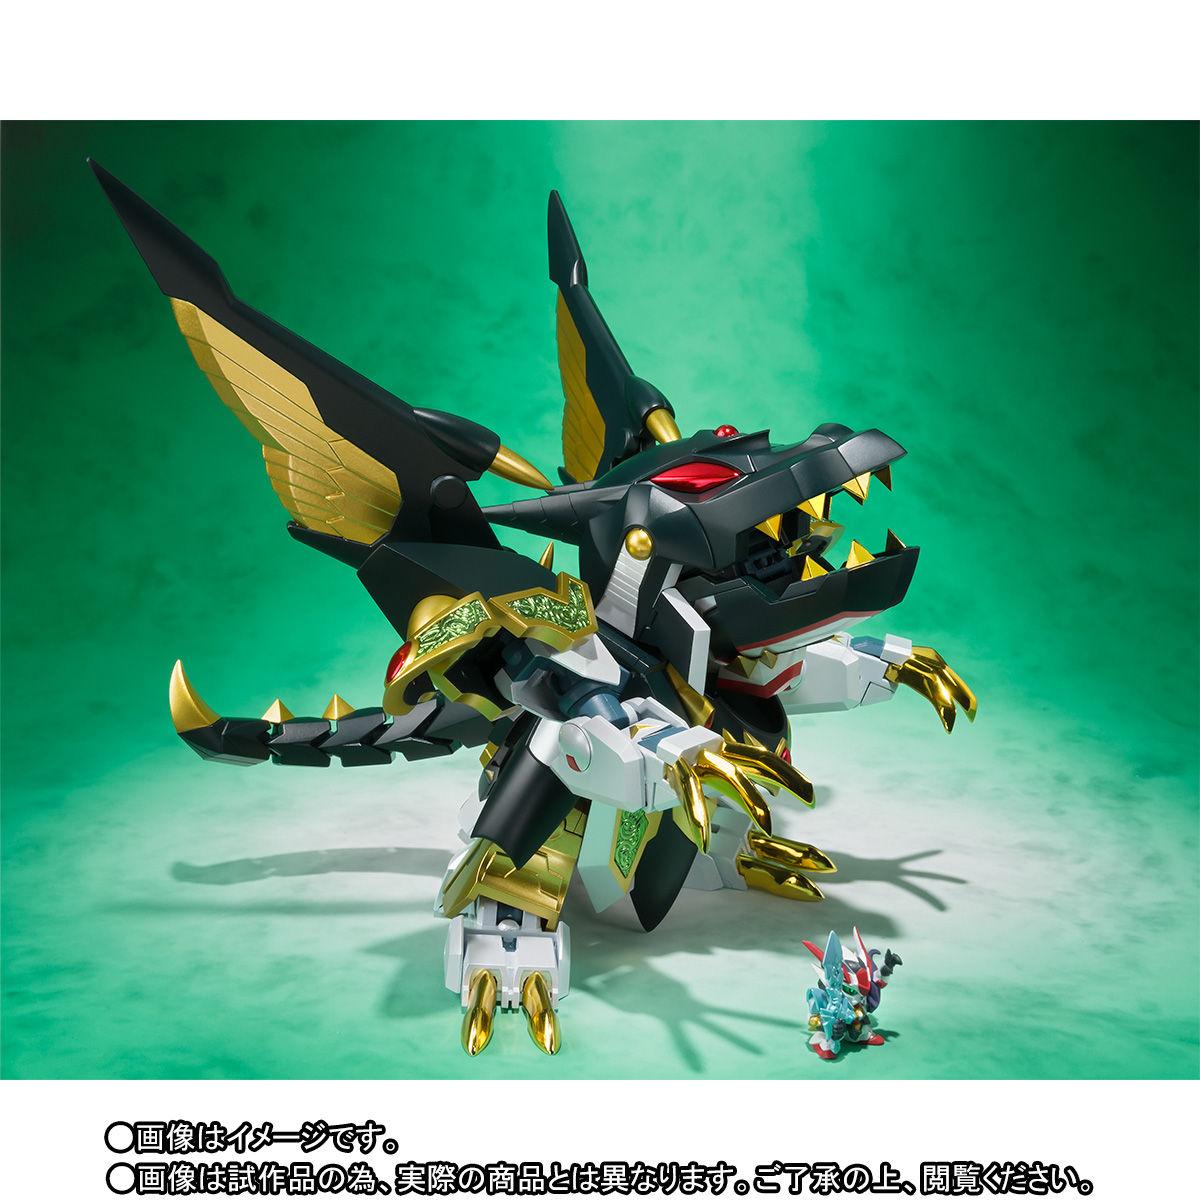 SDX『龍機ドラグーン|新SDガンダム外伝』可変可動フィギュア-007